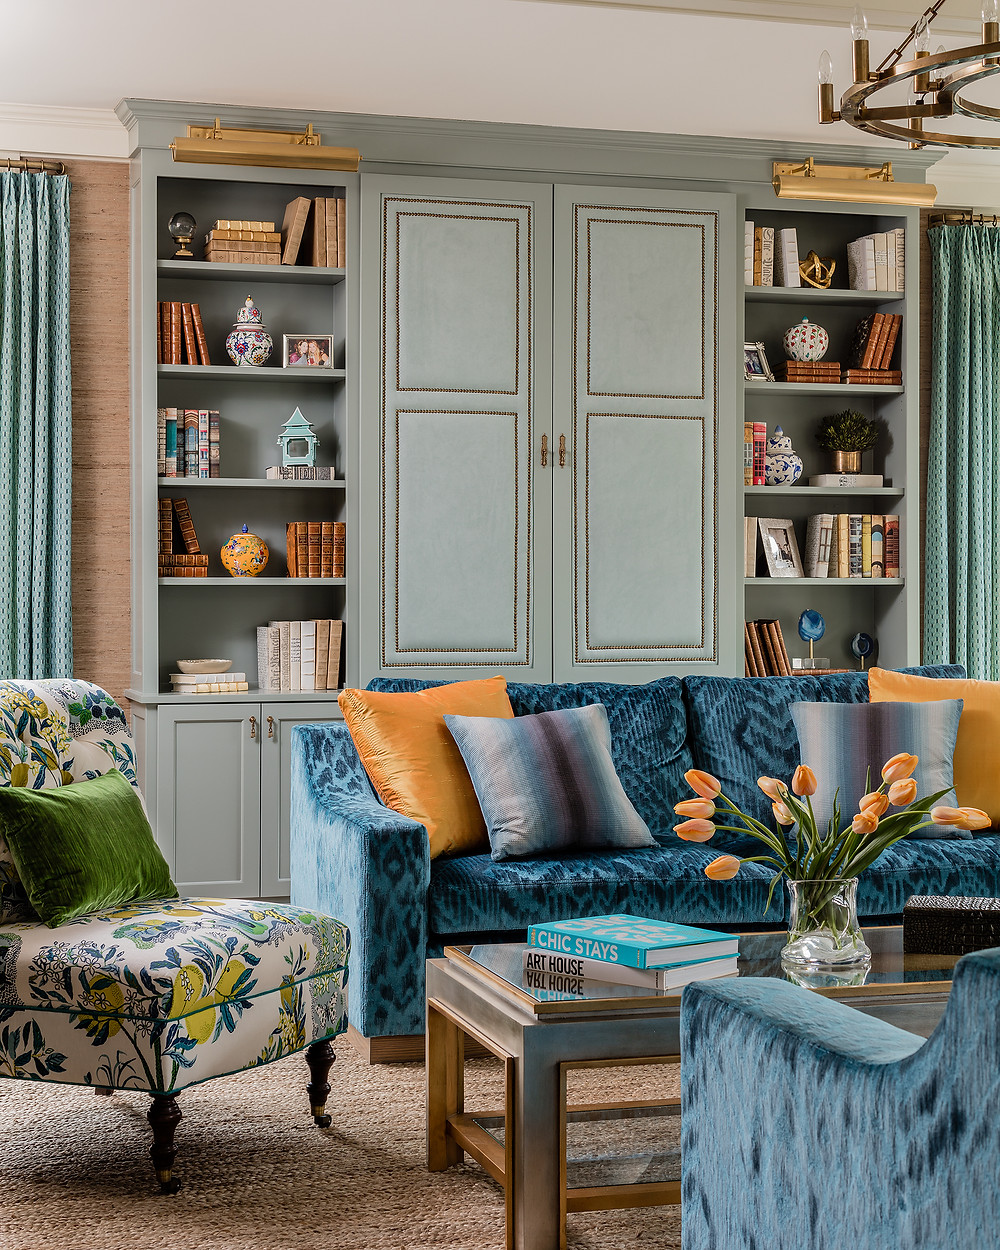 Robin Gannon Interiors, Brass Picture Lights, Blue Sofa, Green Pillow, Yellow Pillow, Blue Pillow, Styling, Tulips